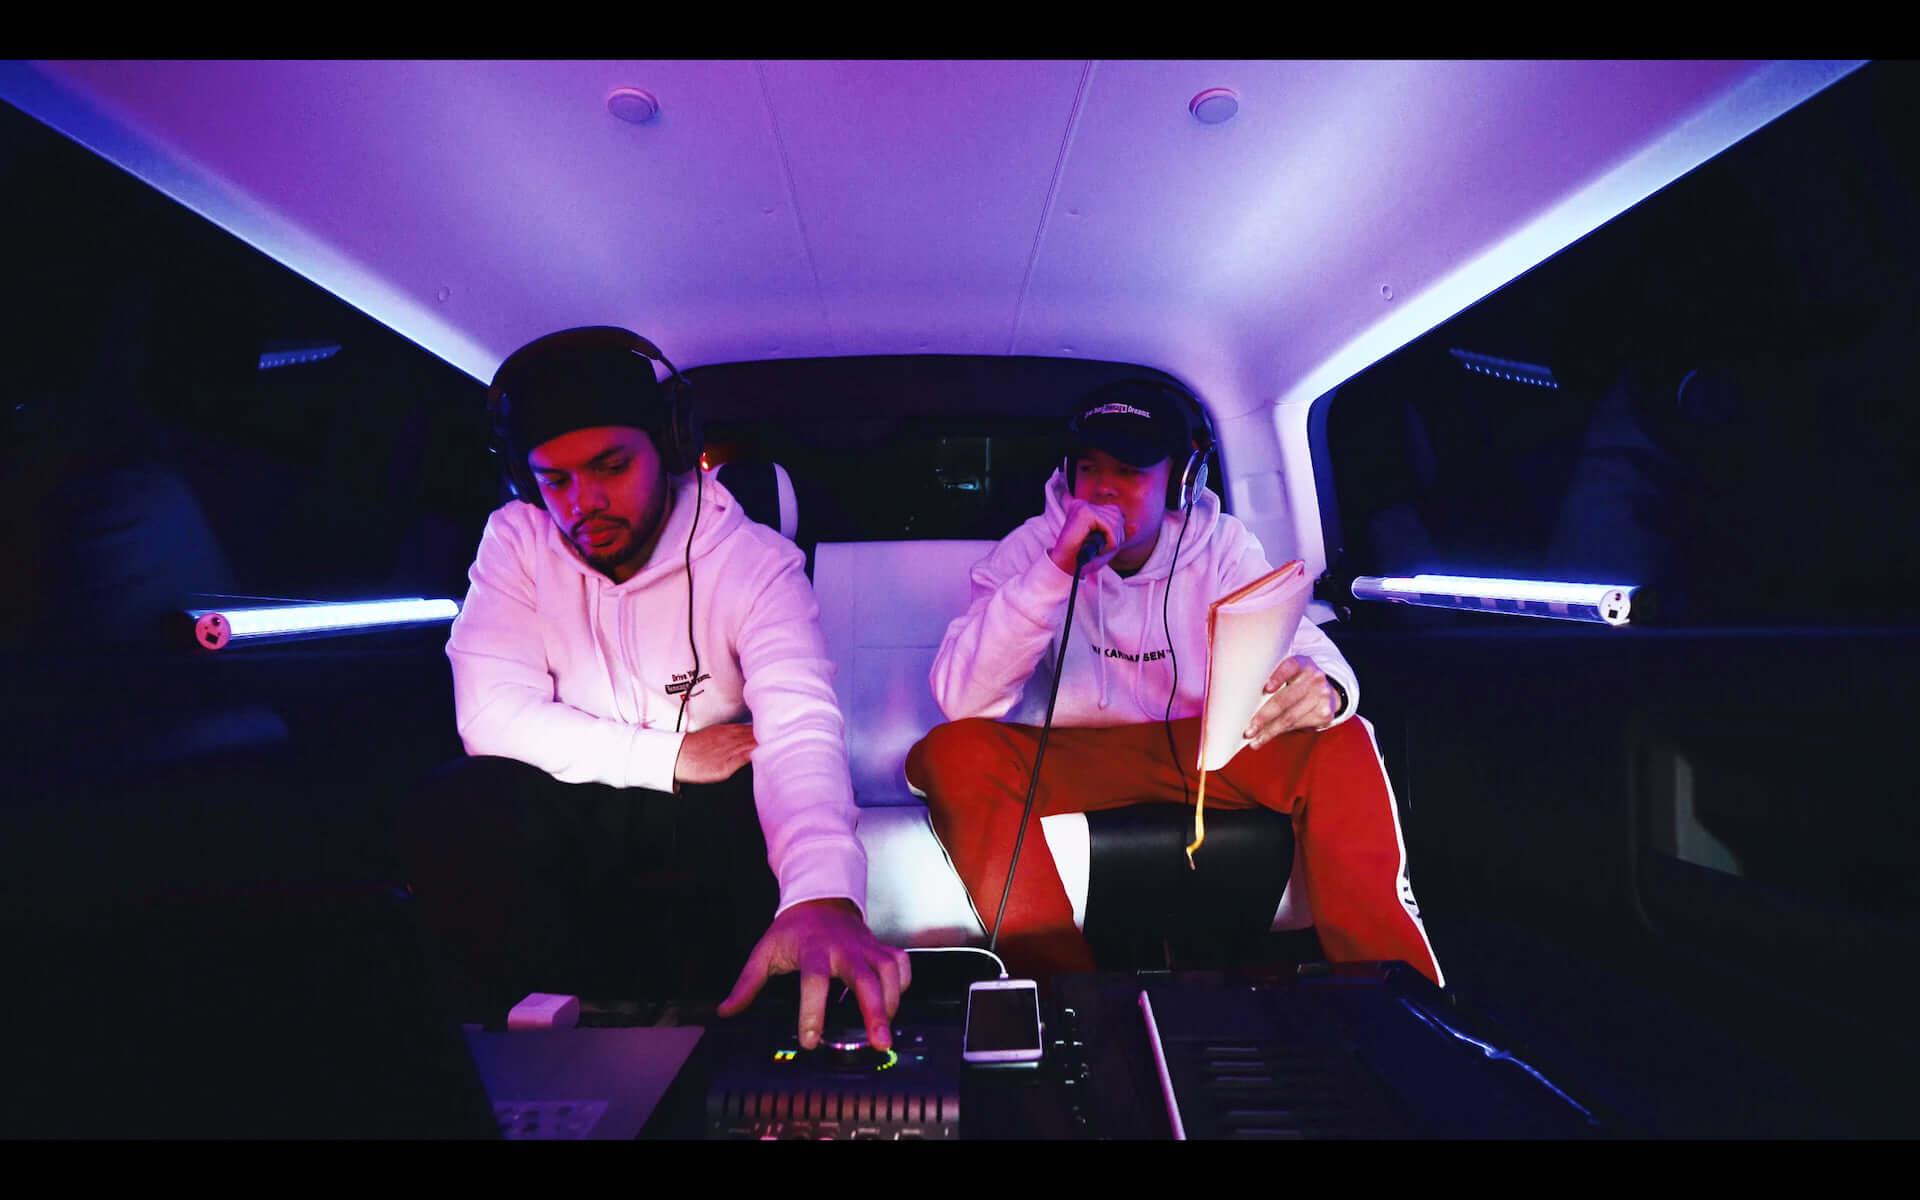 "MIYACHIとMatt Cabがコラボ!トヨタ・ハイエースの""音""を用いて制作された楽曲とドキュメンタリーが公開 music200316_play_hiace_3-1920x1200"